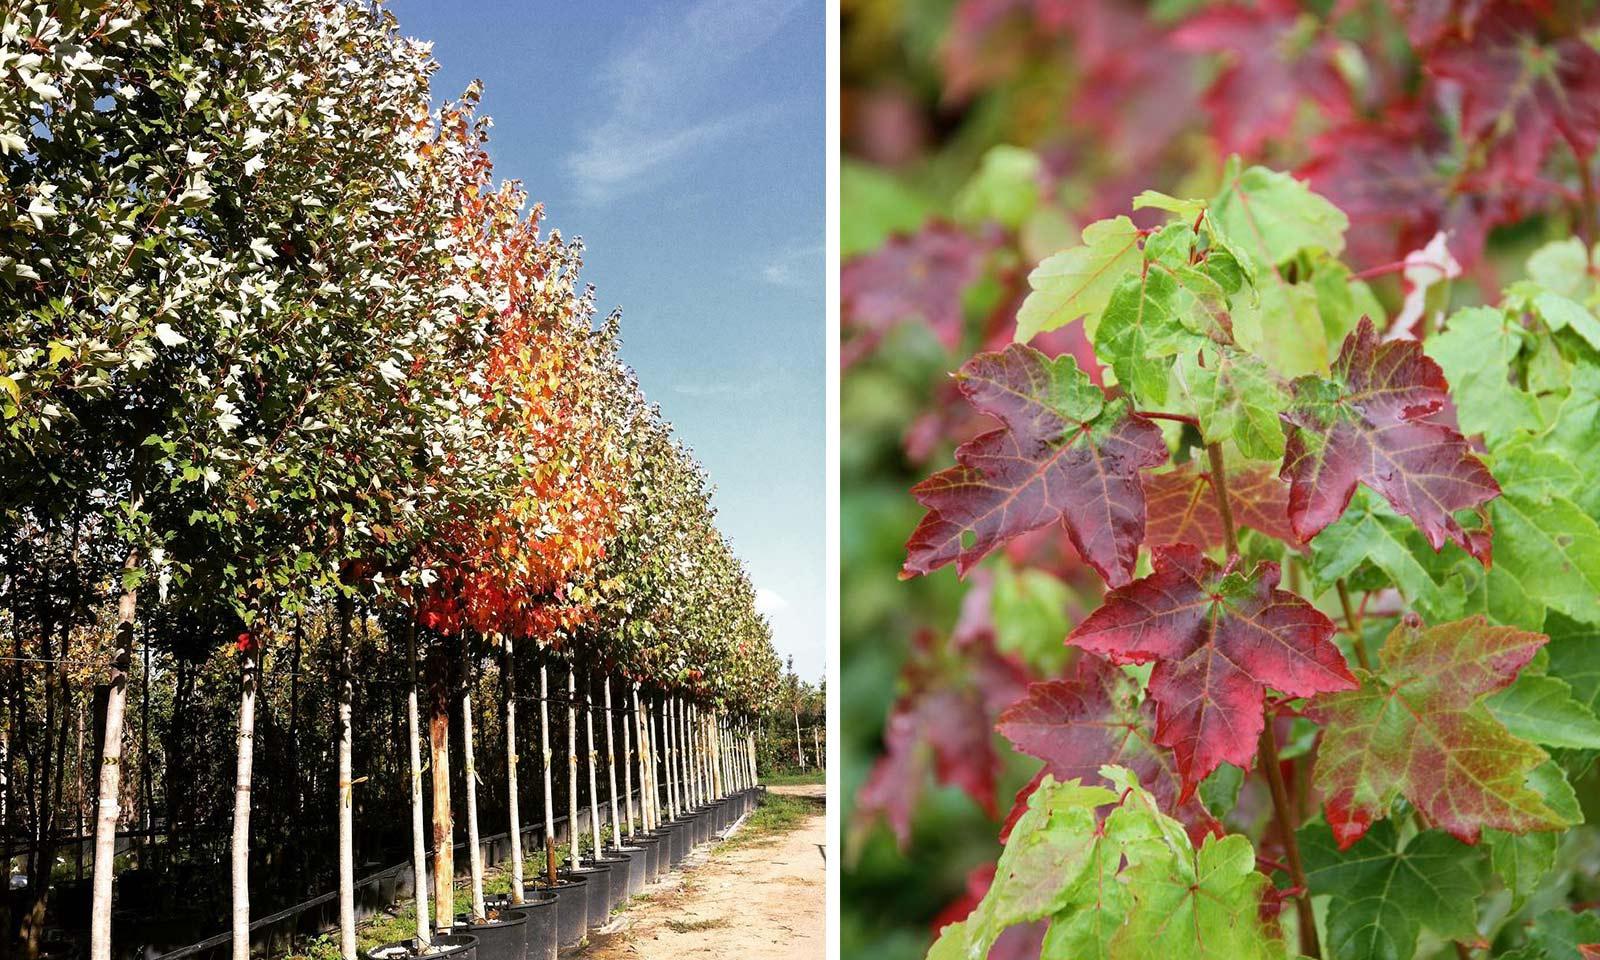 Acer Rubrum 'October Glory' (Red Maple 'October Glory') - Standard